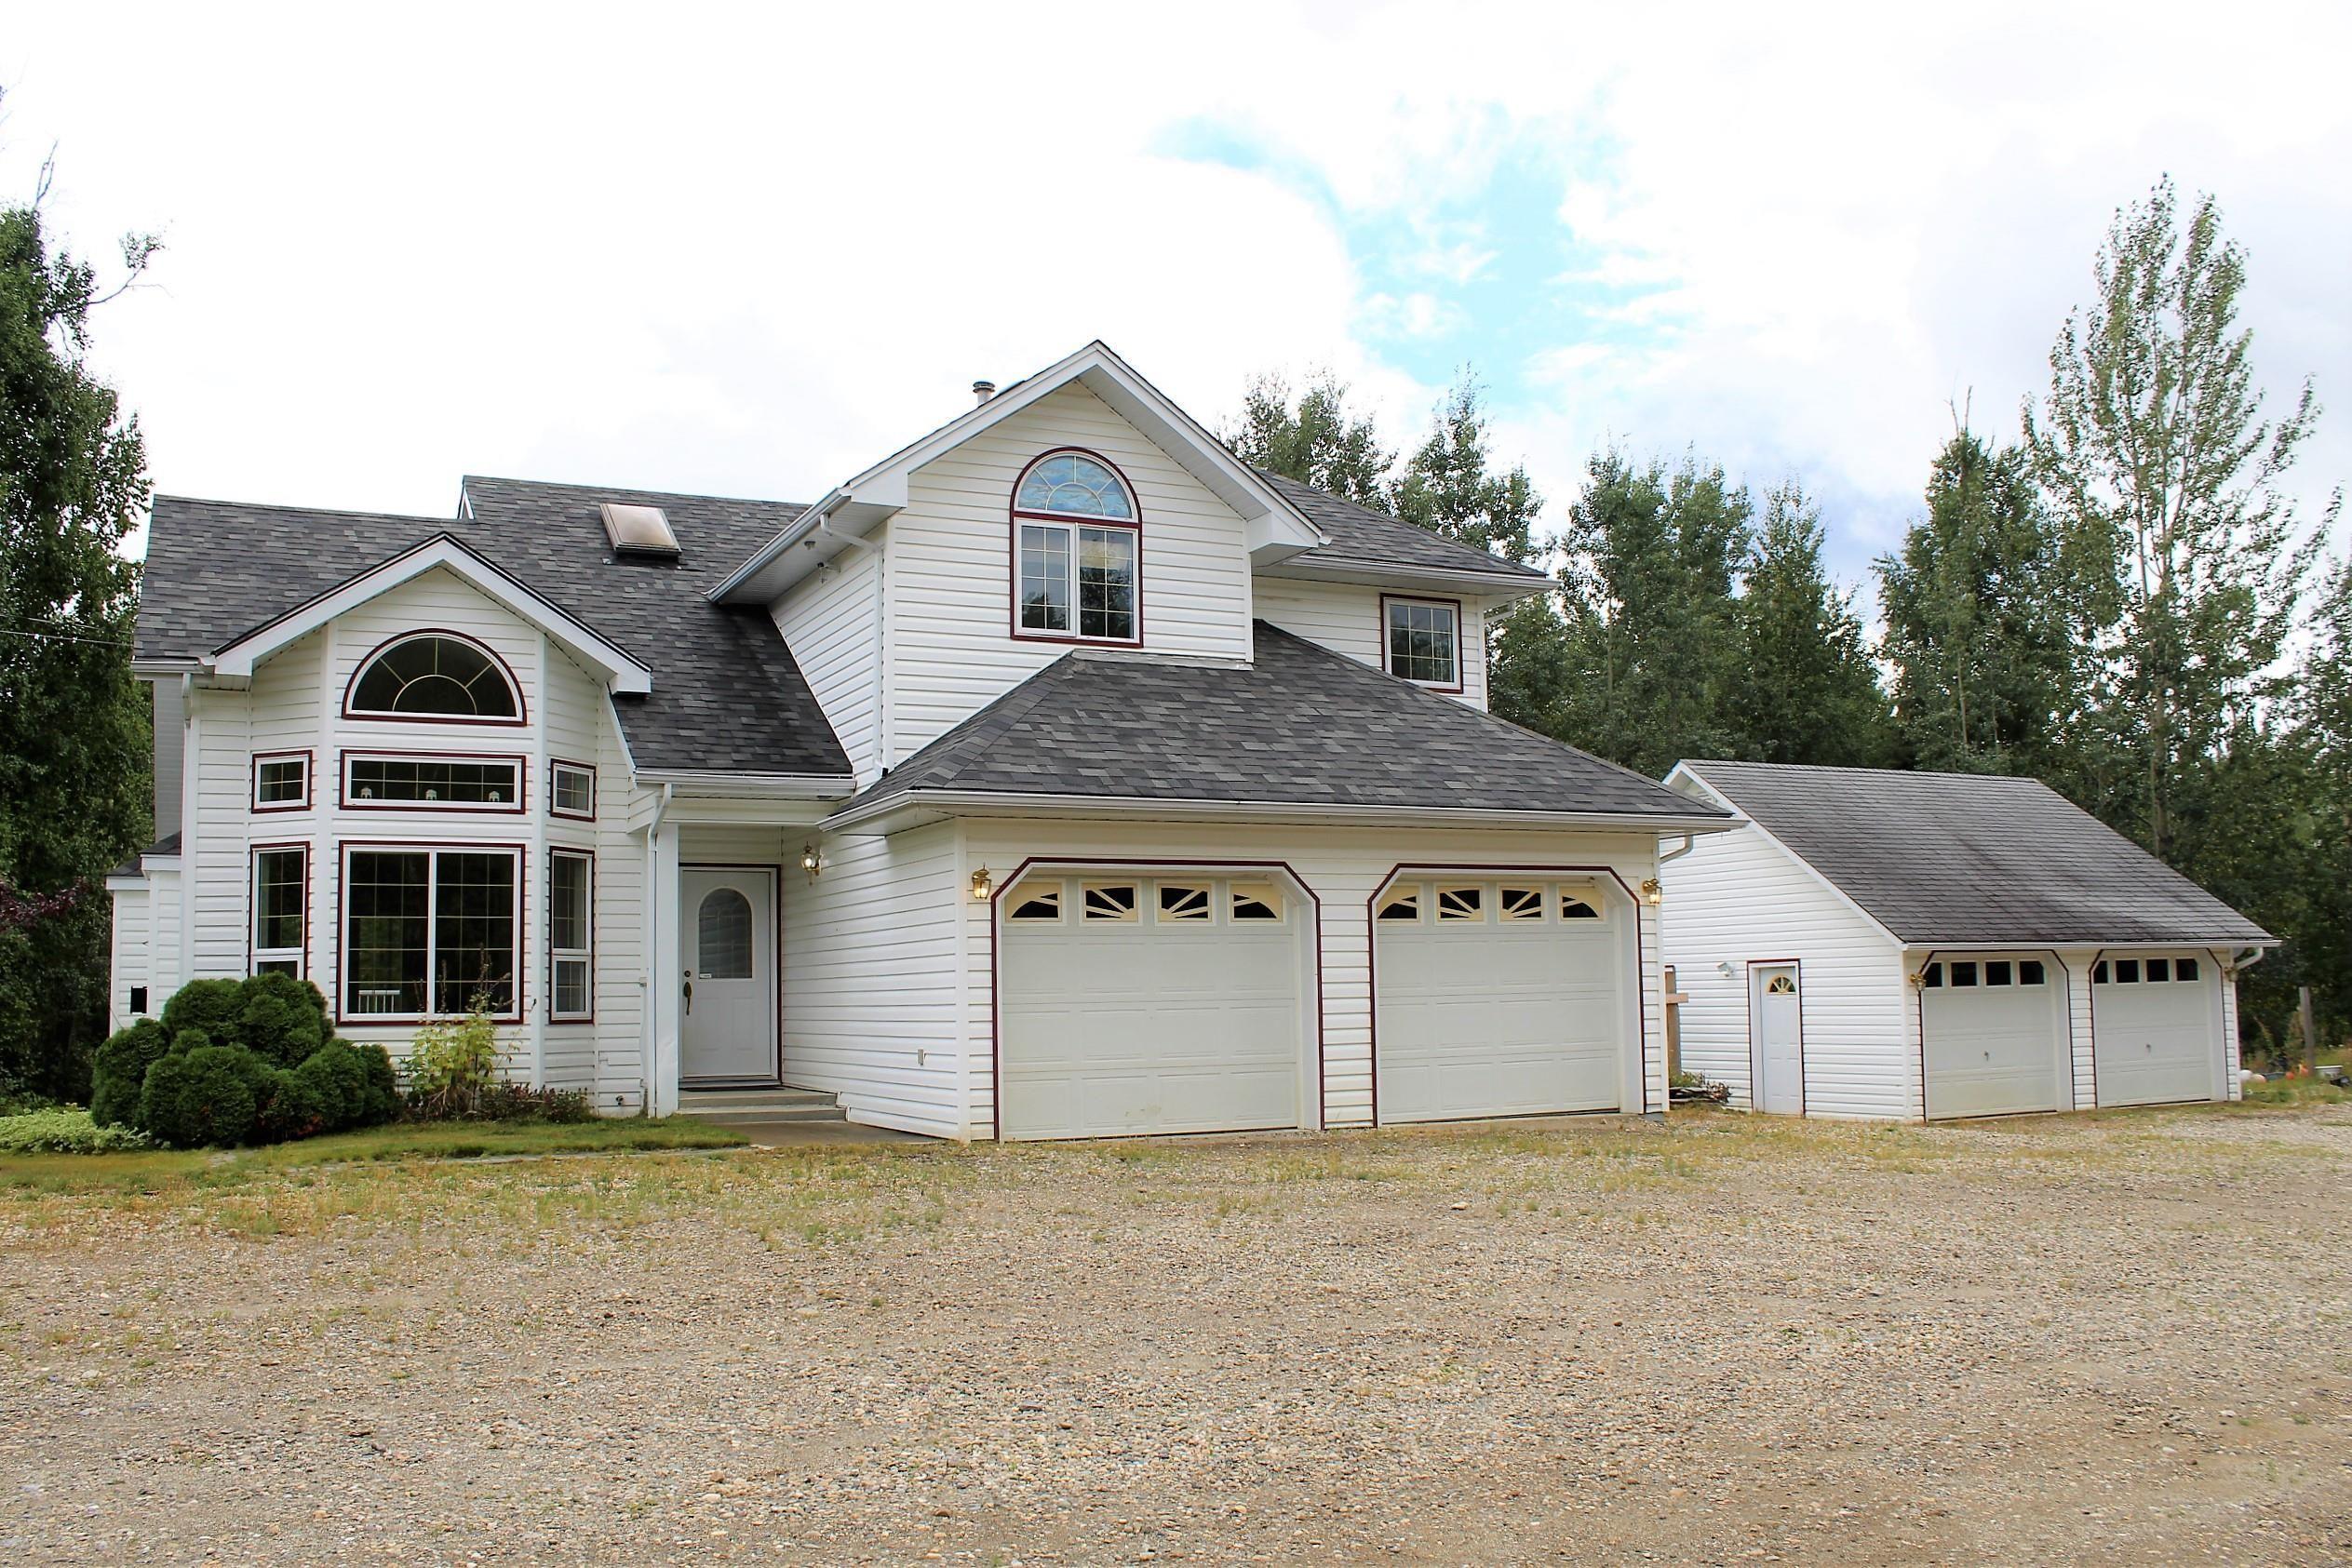 Main Photo: 26 MANITOBA Drive in Mackenzie: Mackenzie - Rural House for sale (Mackenzie (Zone 69))  : MLS®# R2612690